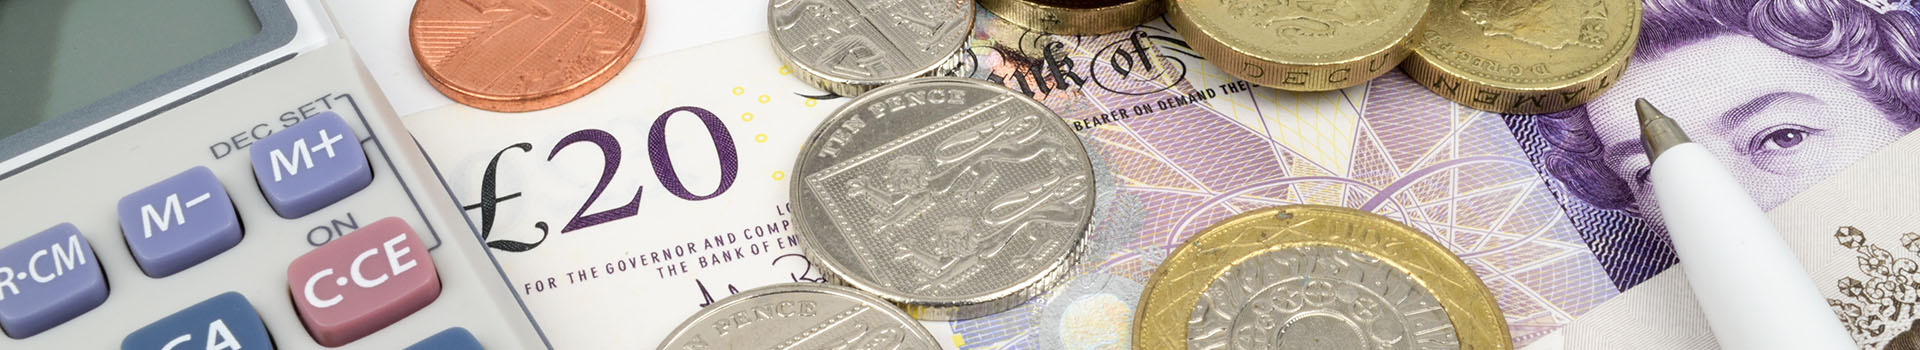 Fair pension settlements Liverpool